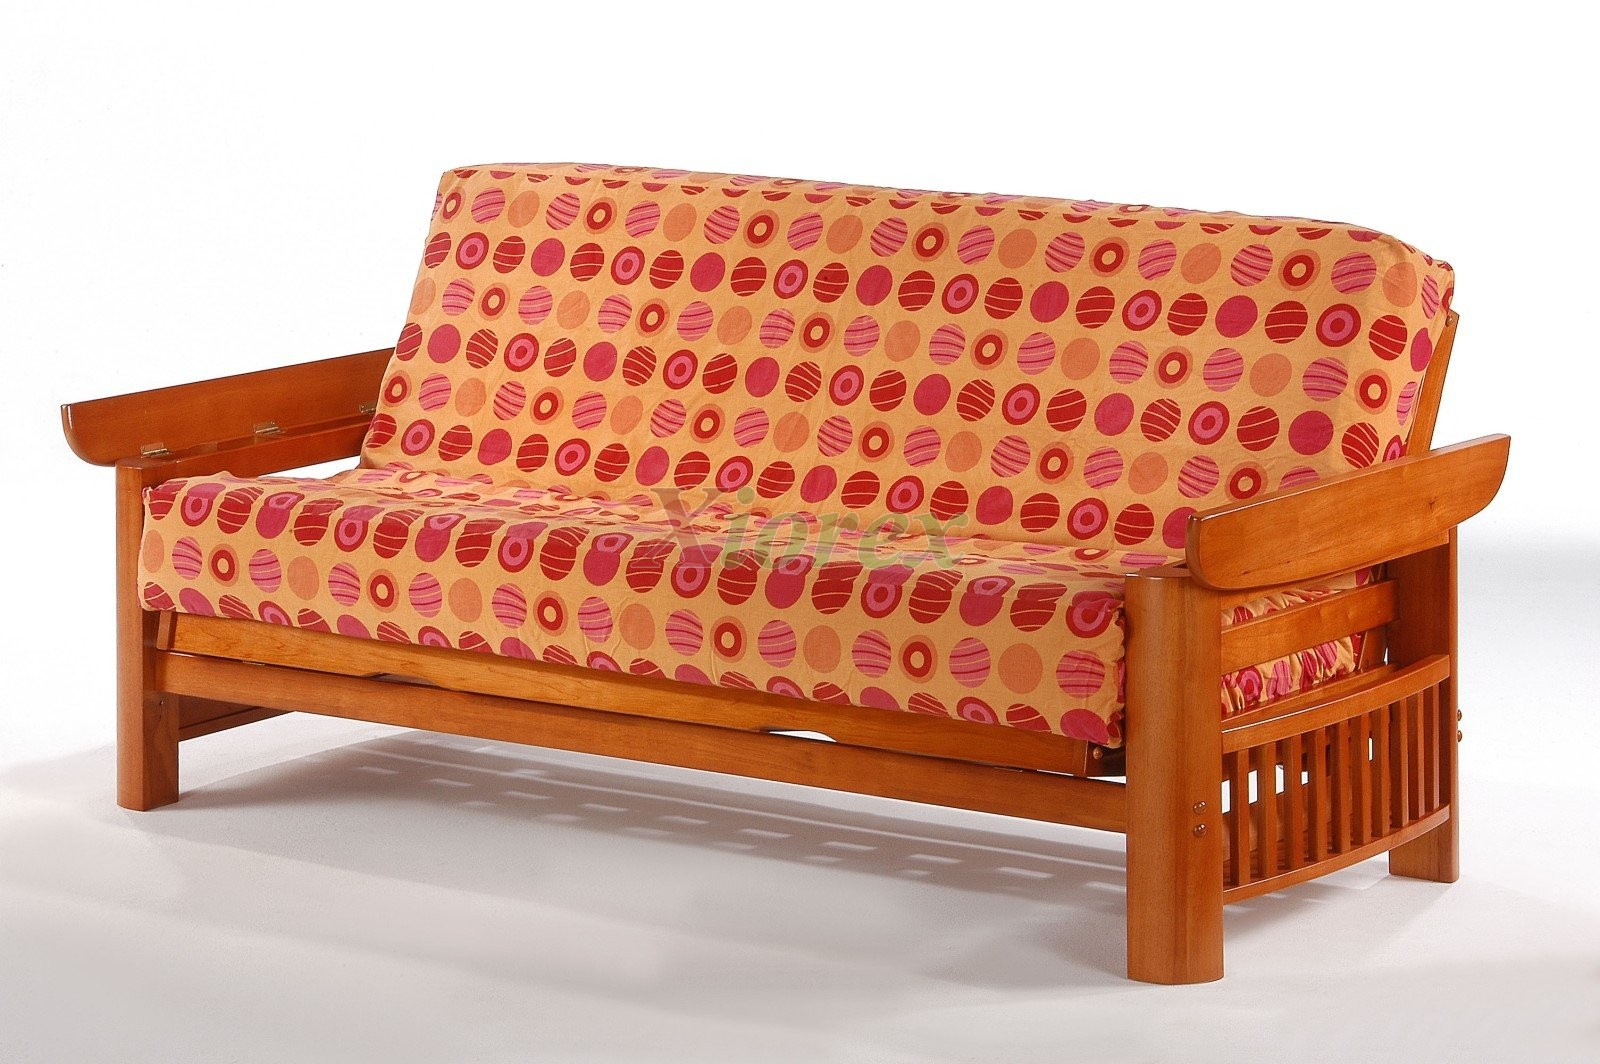 standard futon sofabed night and day portofino futon teak   xiorex night and day portofino futon sofabed honey oak natural rosewood teak  rh   xiorex